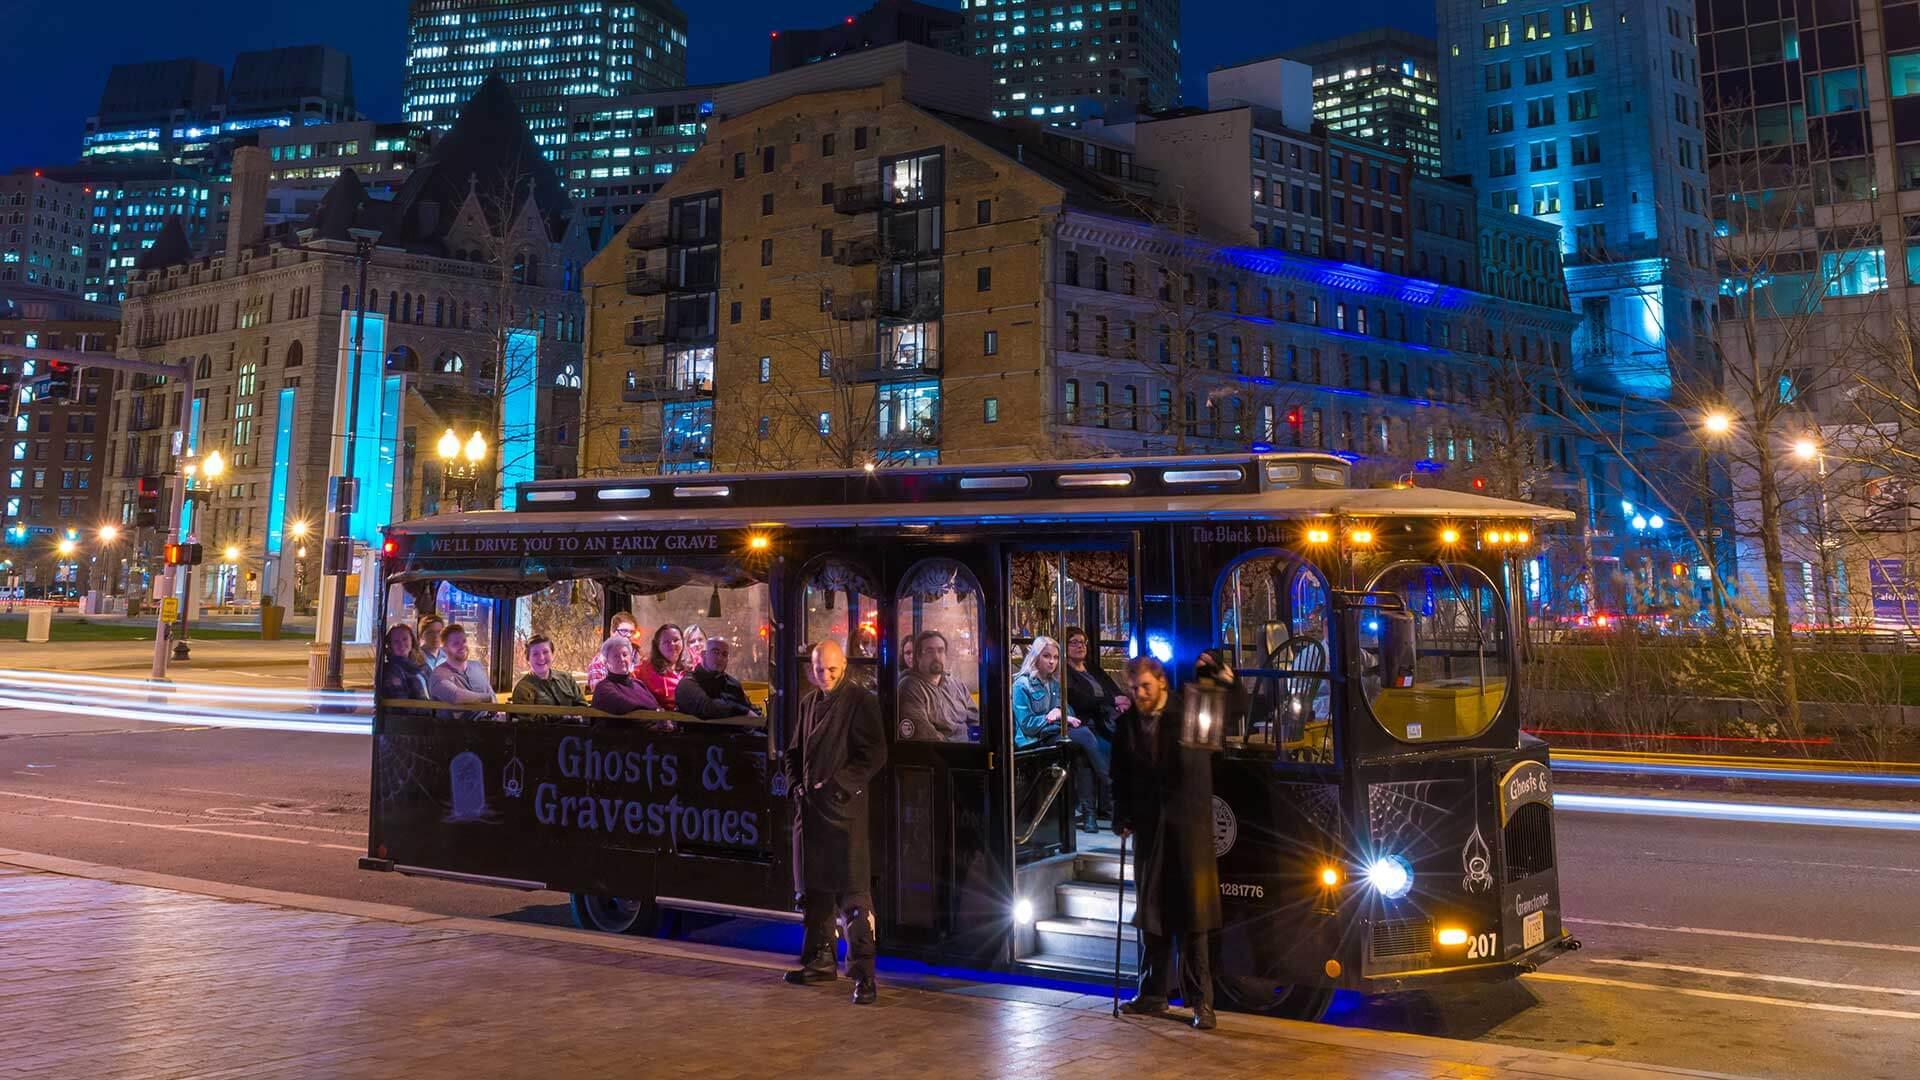 boston ghost tour trolley